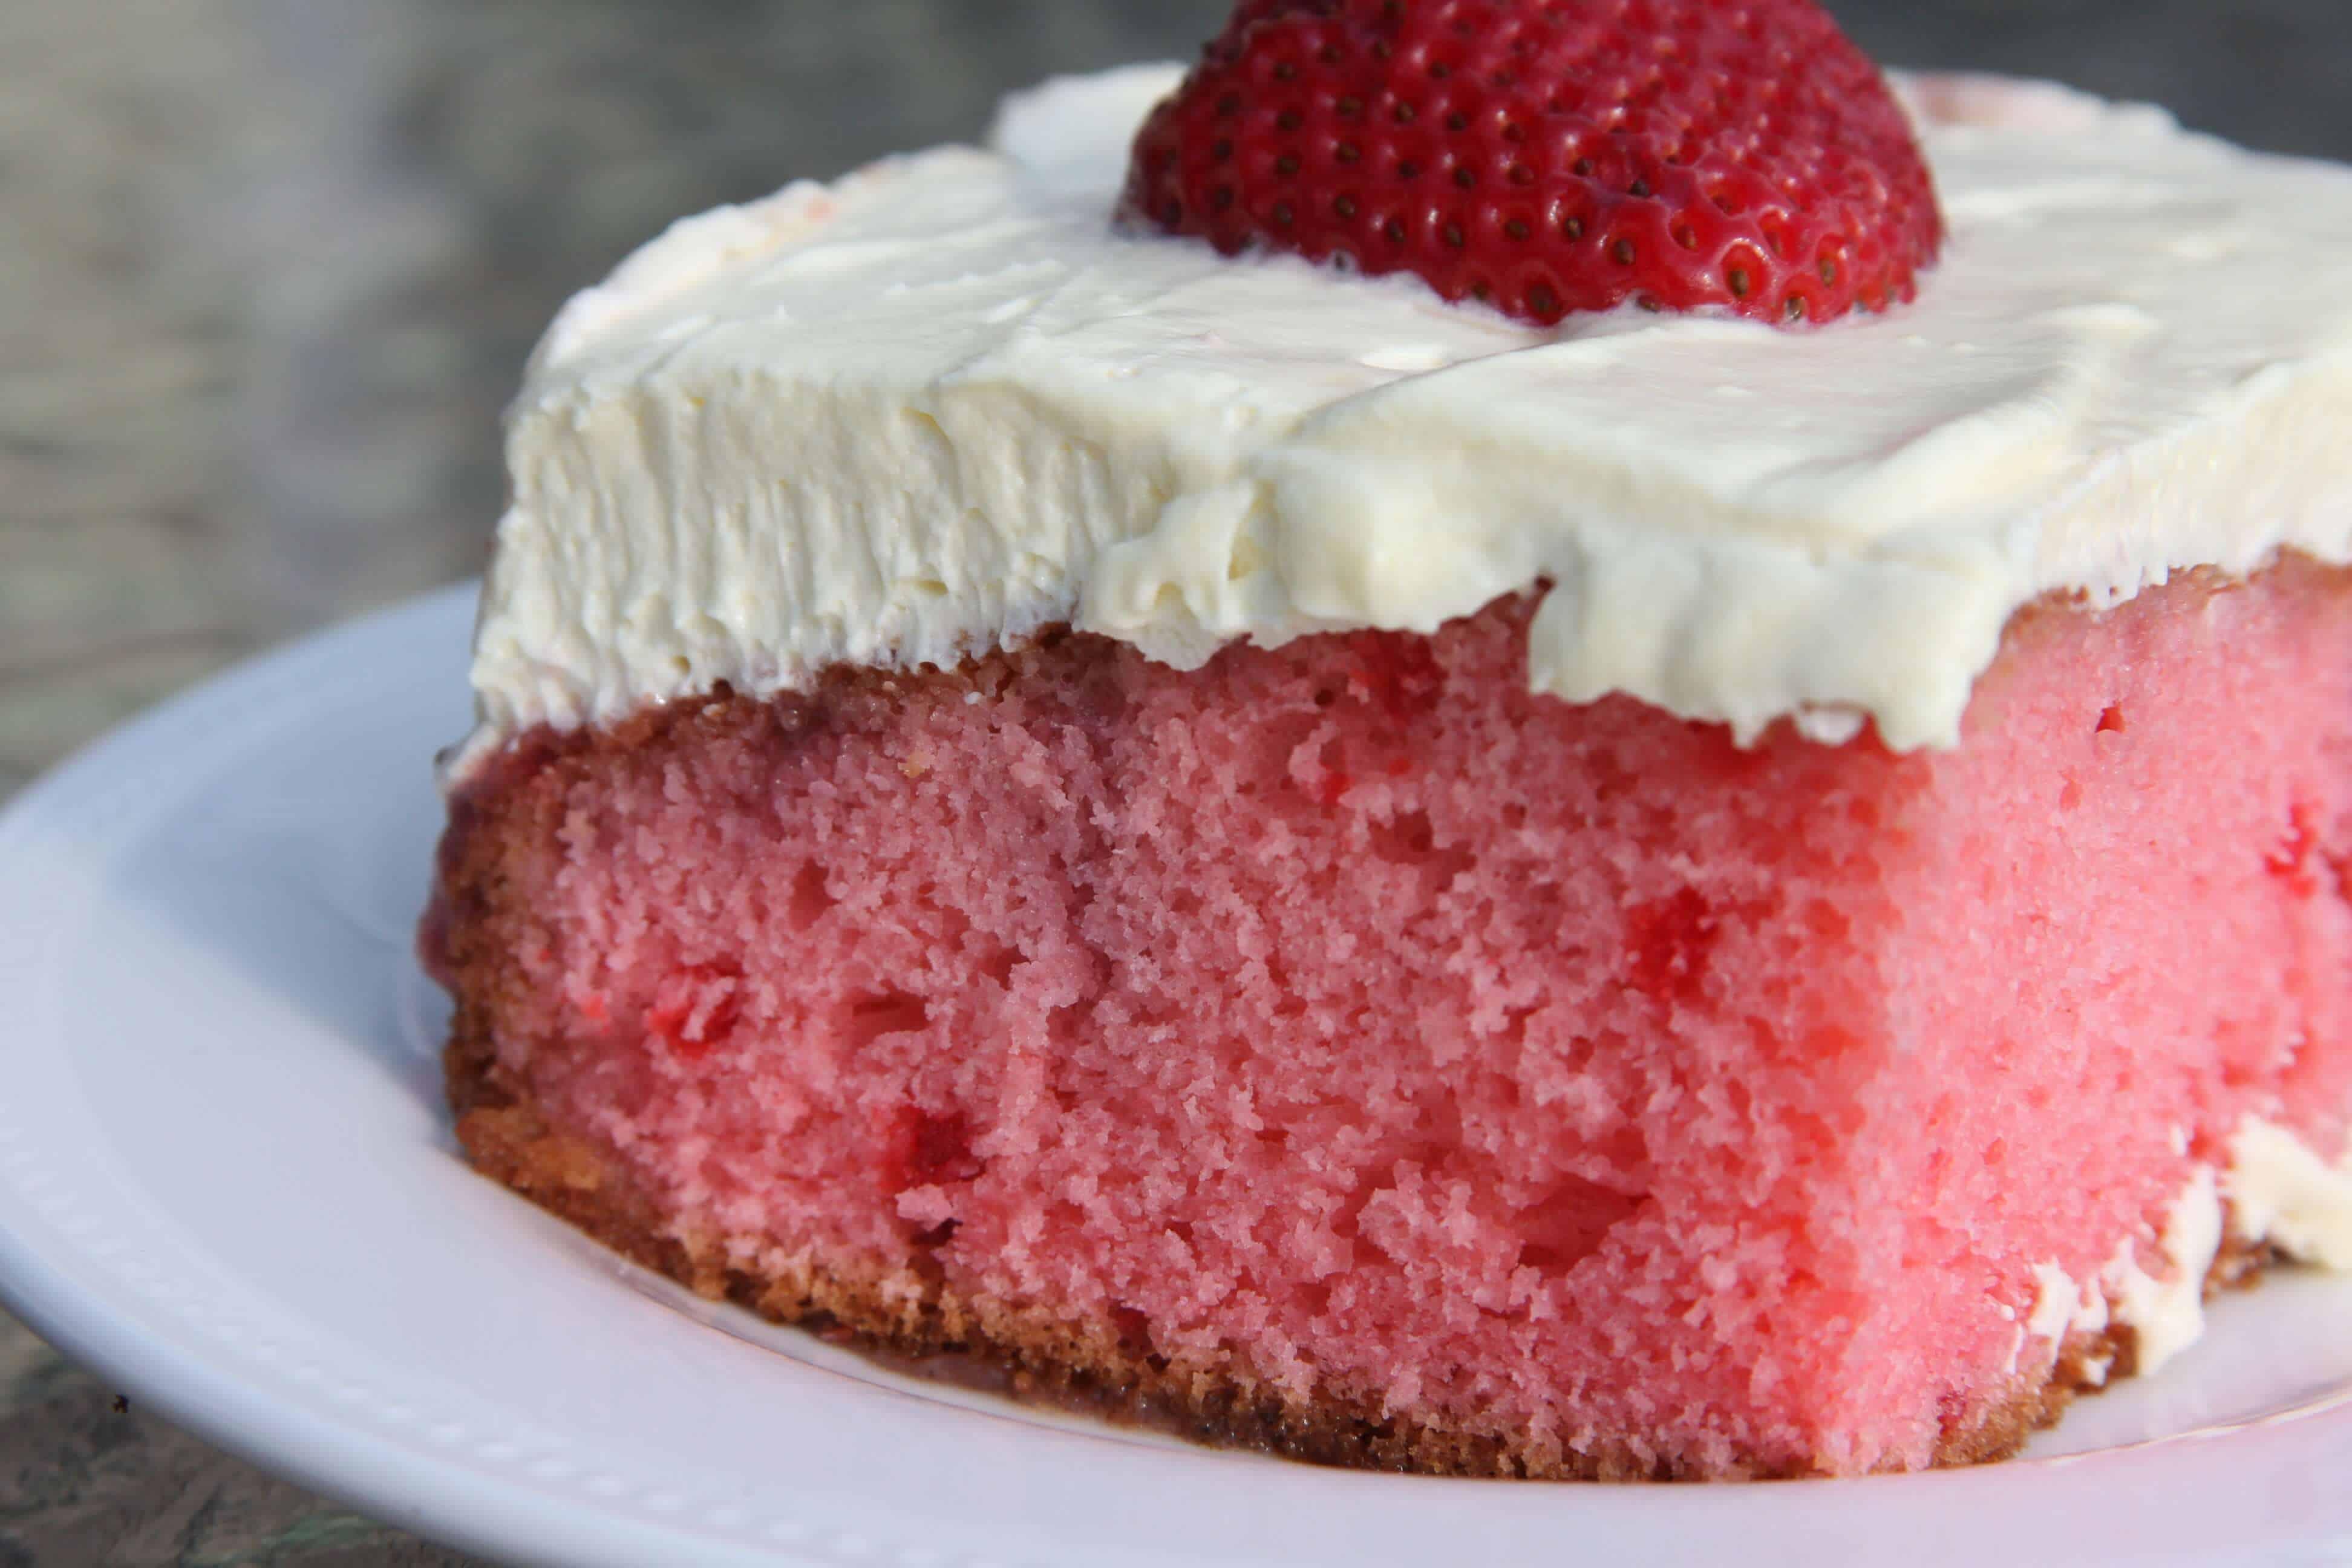 Fresh strawberry poke cake on a white plate